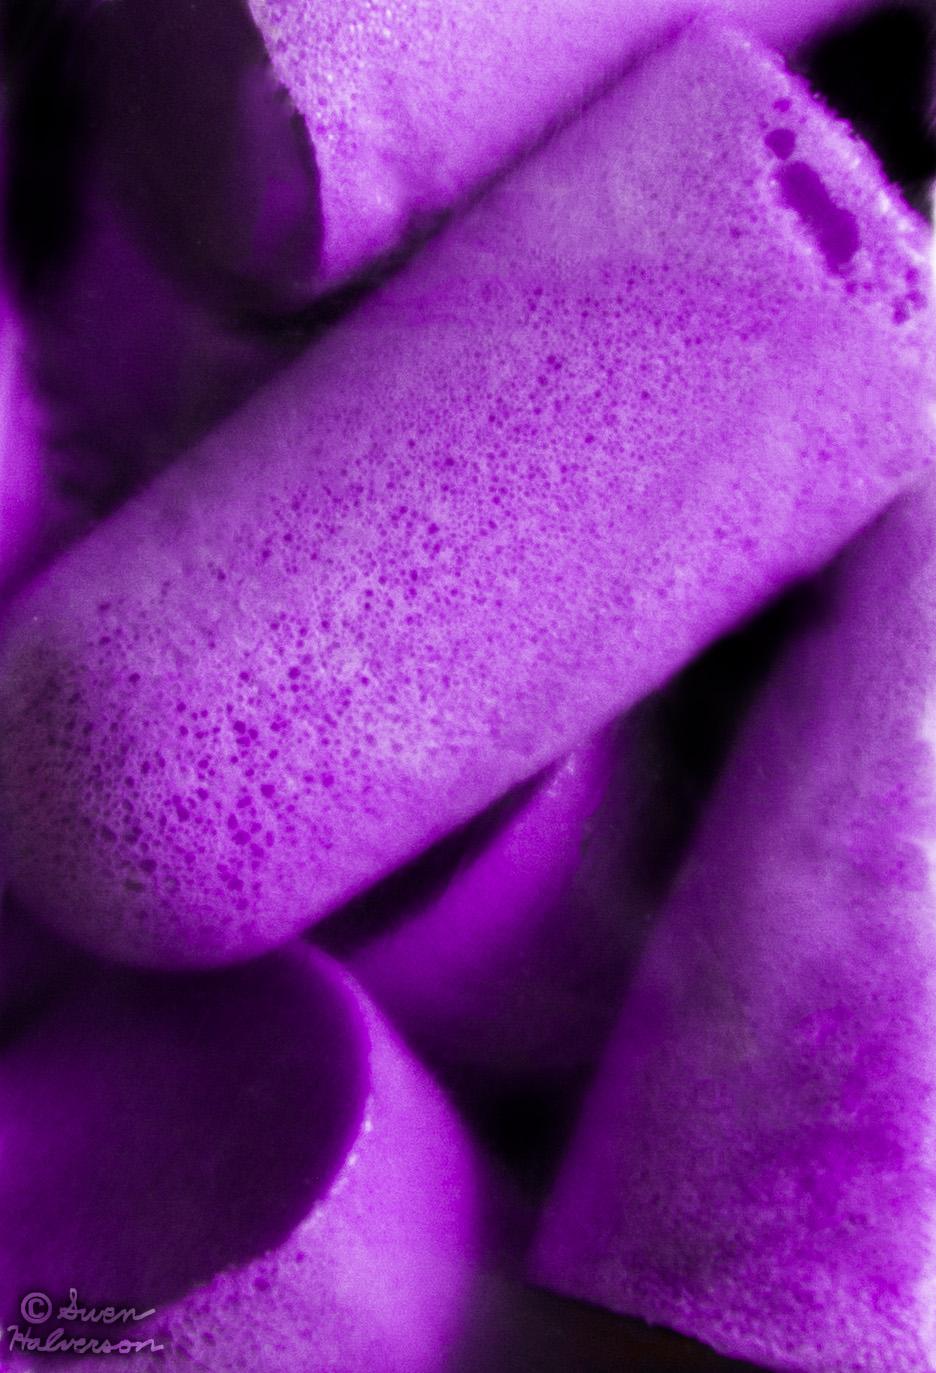 Theme: Purple